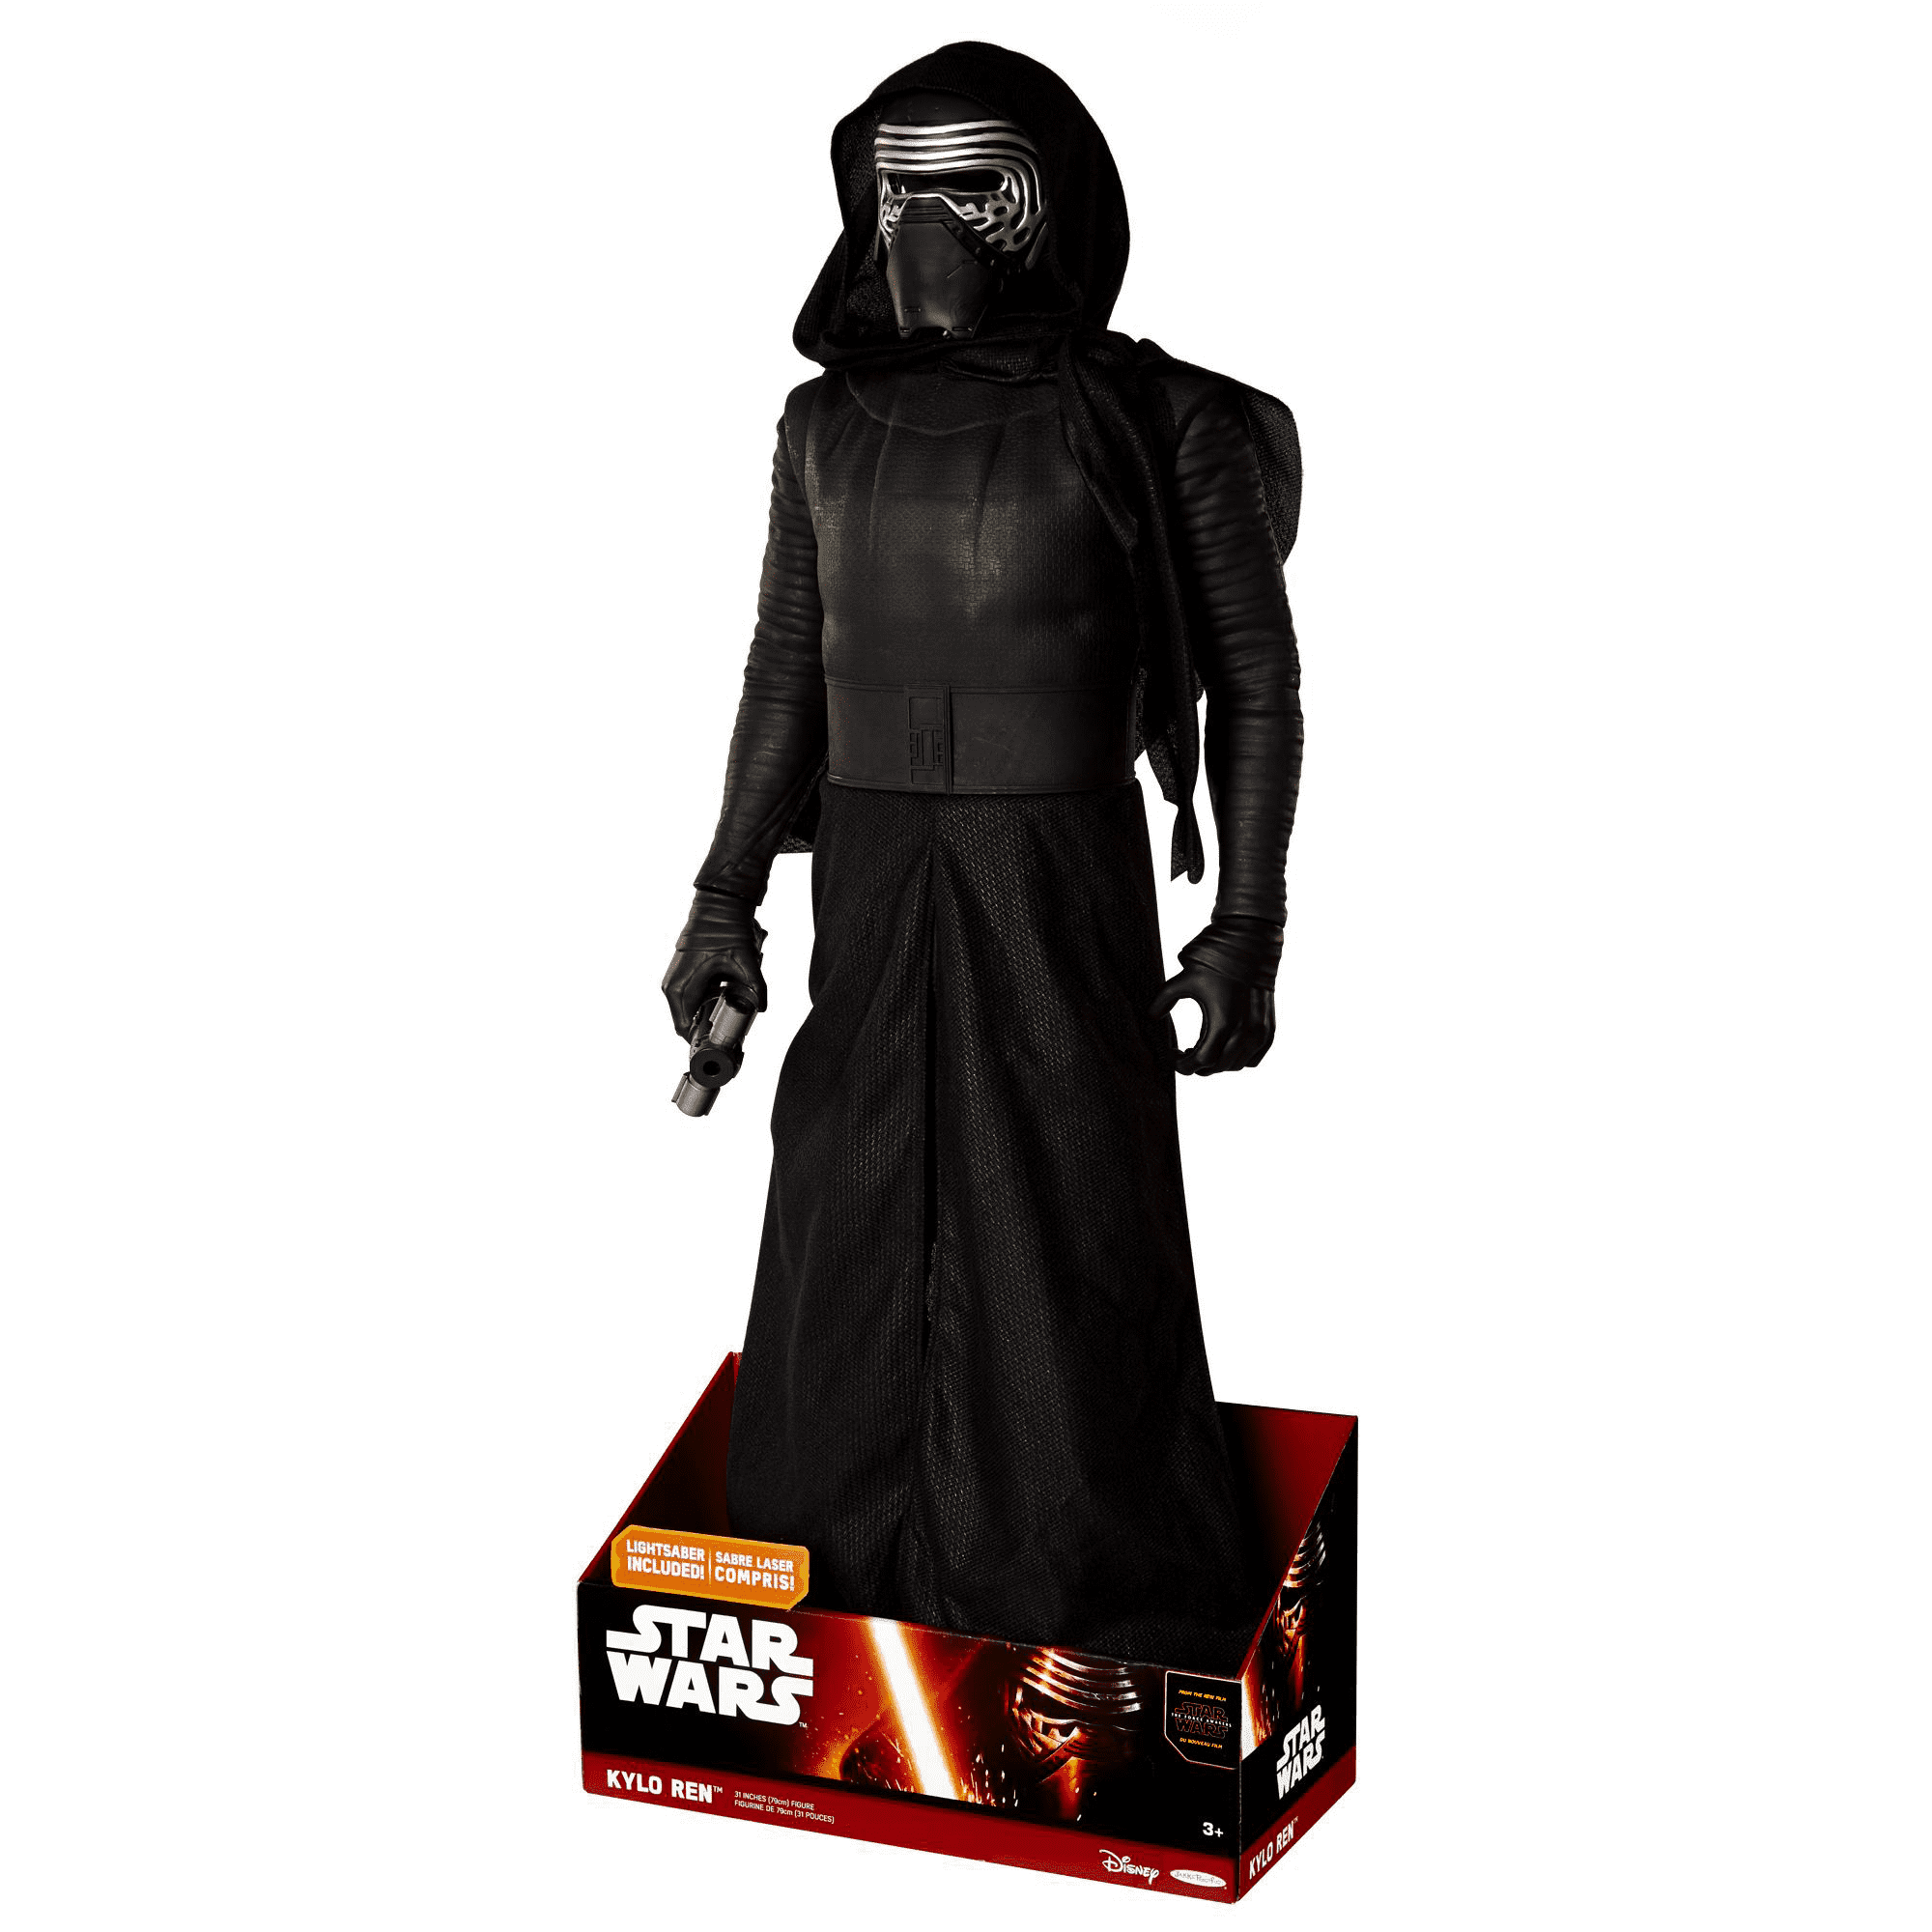 Star Wars Personaggio Gigante Kylo Ren